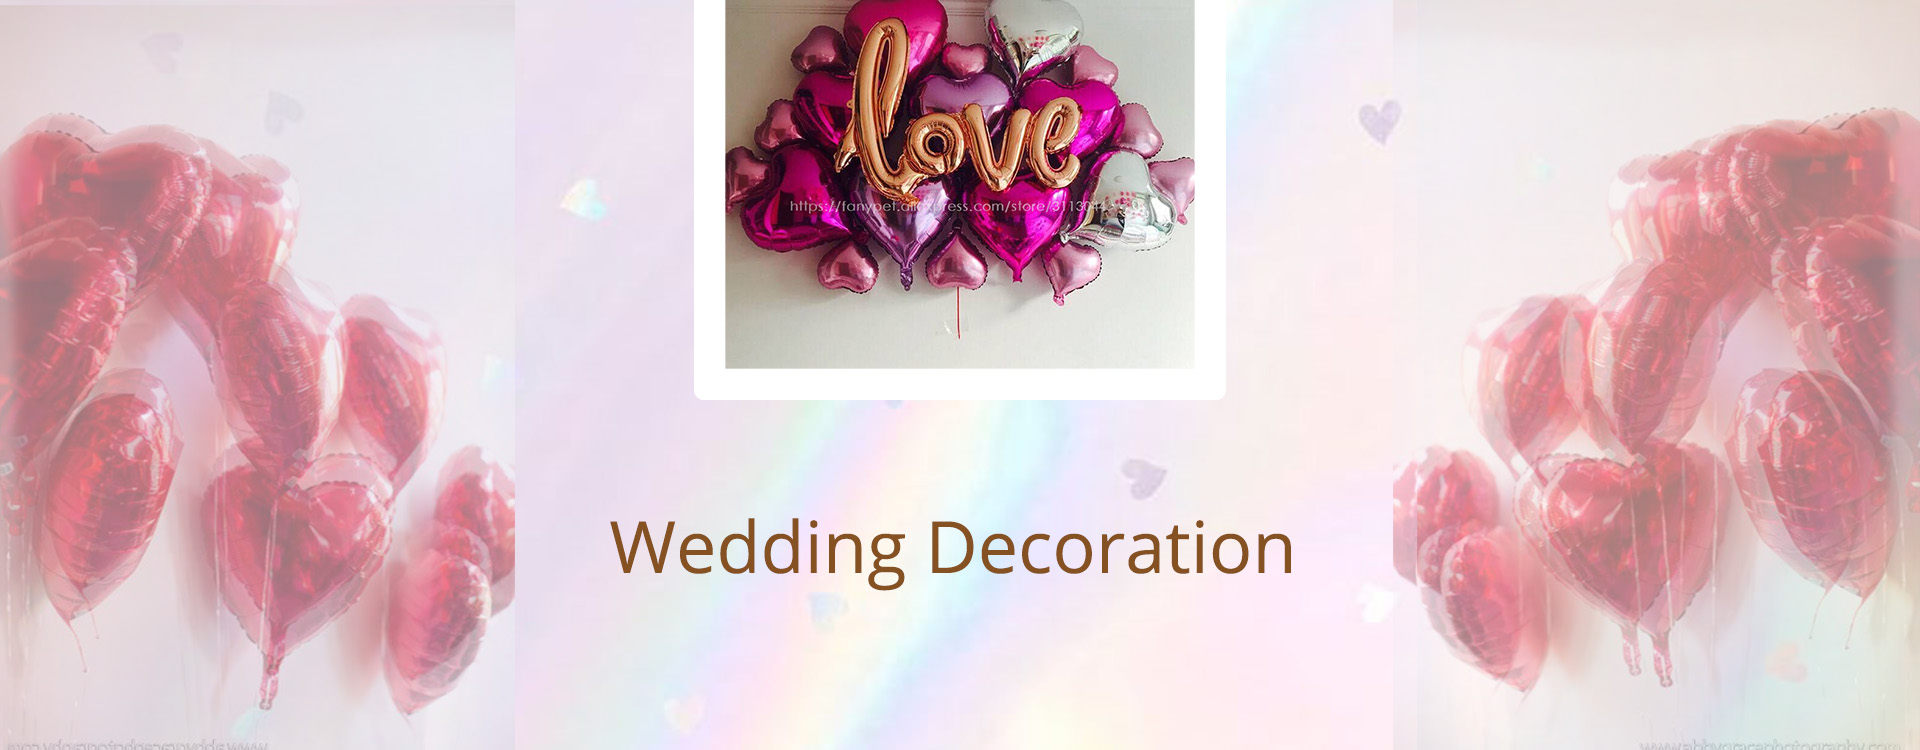 Dorable Wedding Decorations Online Store Elaboration - Wedding Idea ...